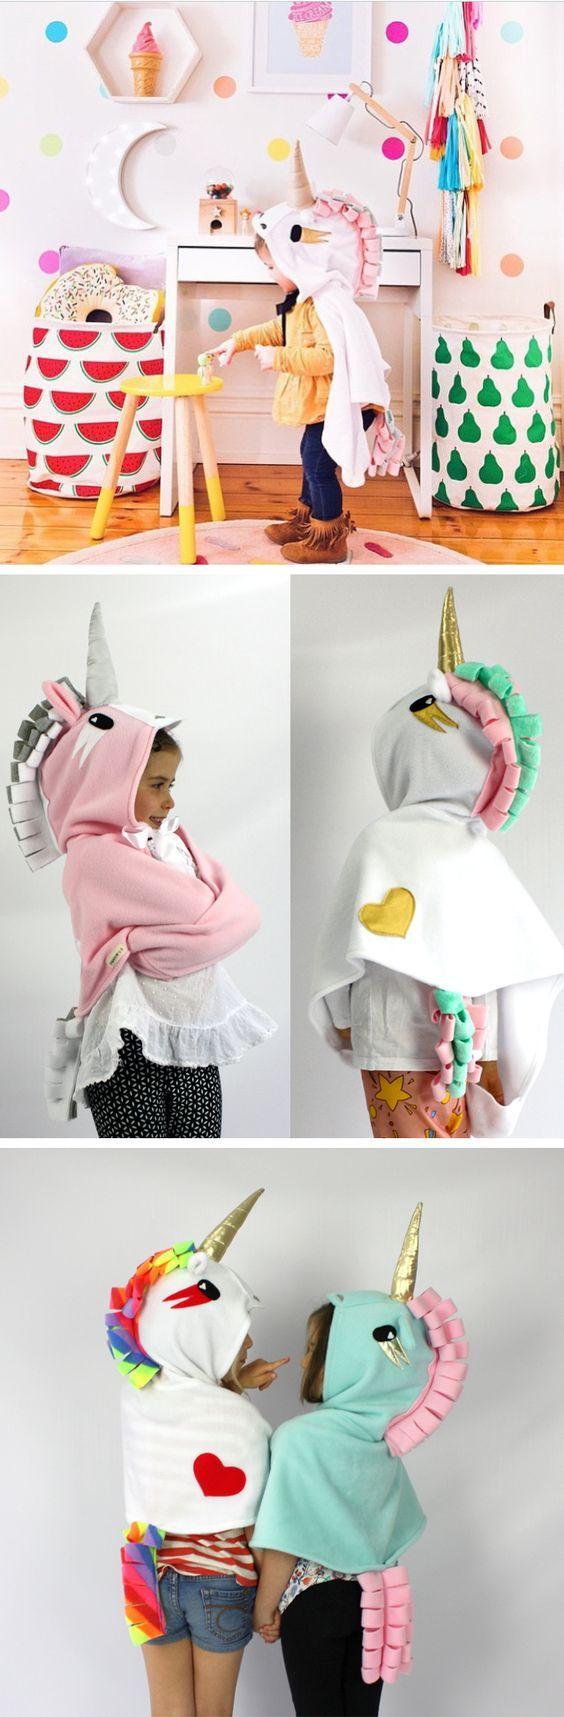 Unicorn Costume - Children's Handmade dress-up for imaginative play (Diy Costume Unicorn)